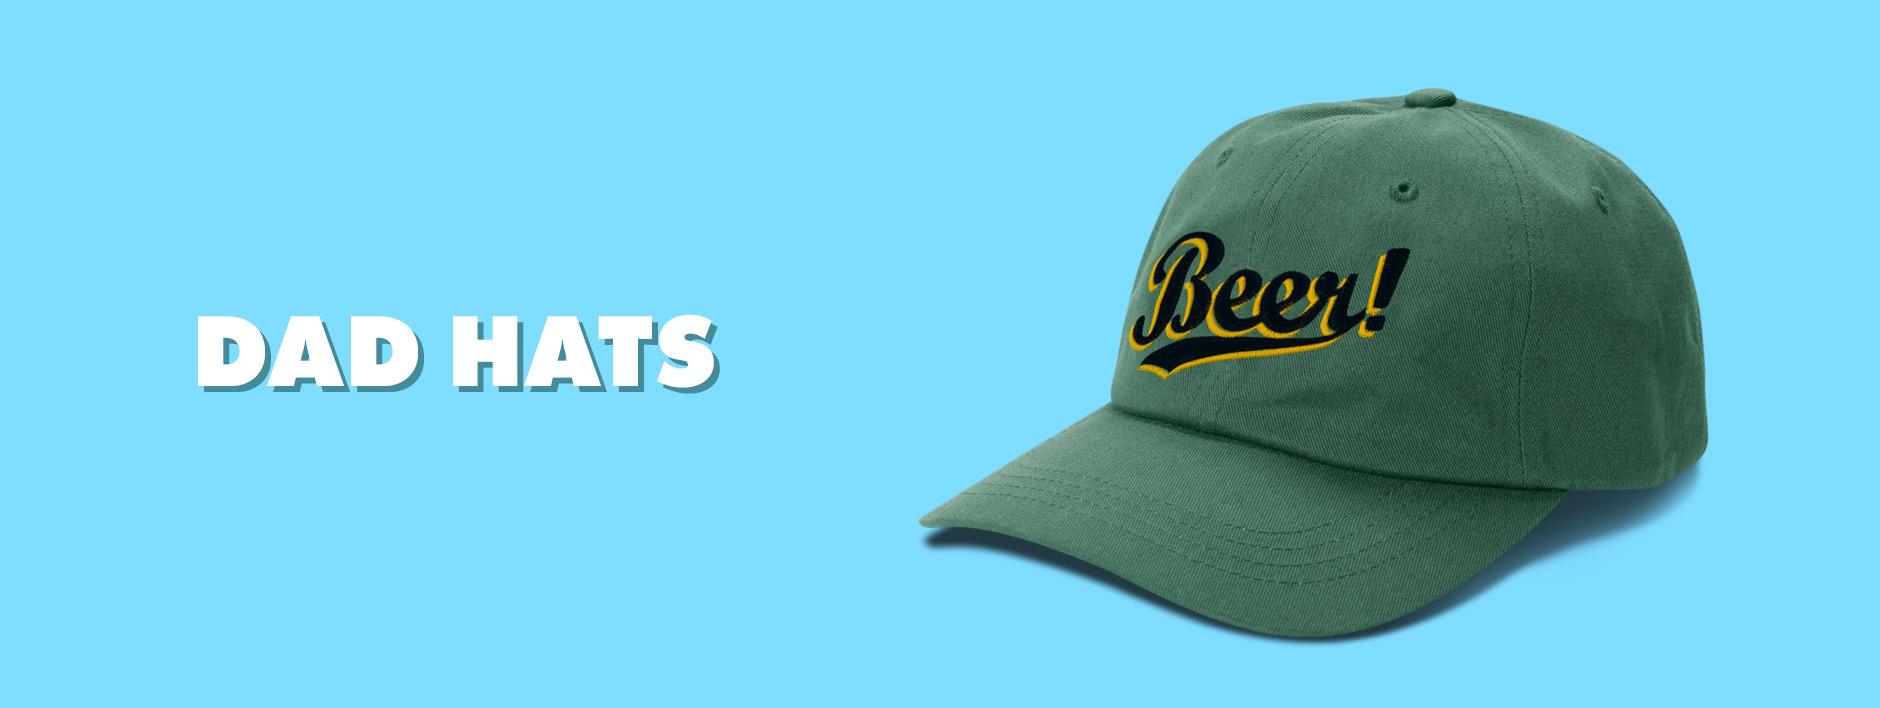 Shop Dad Hats on Threadless